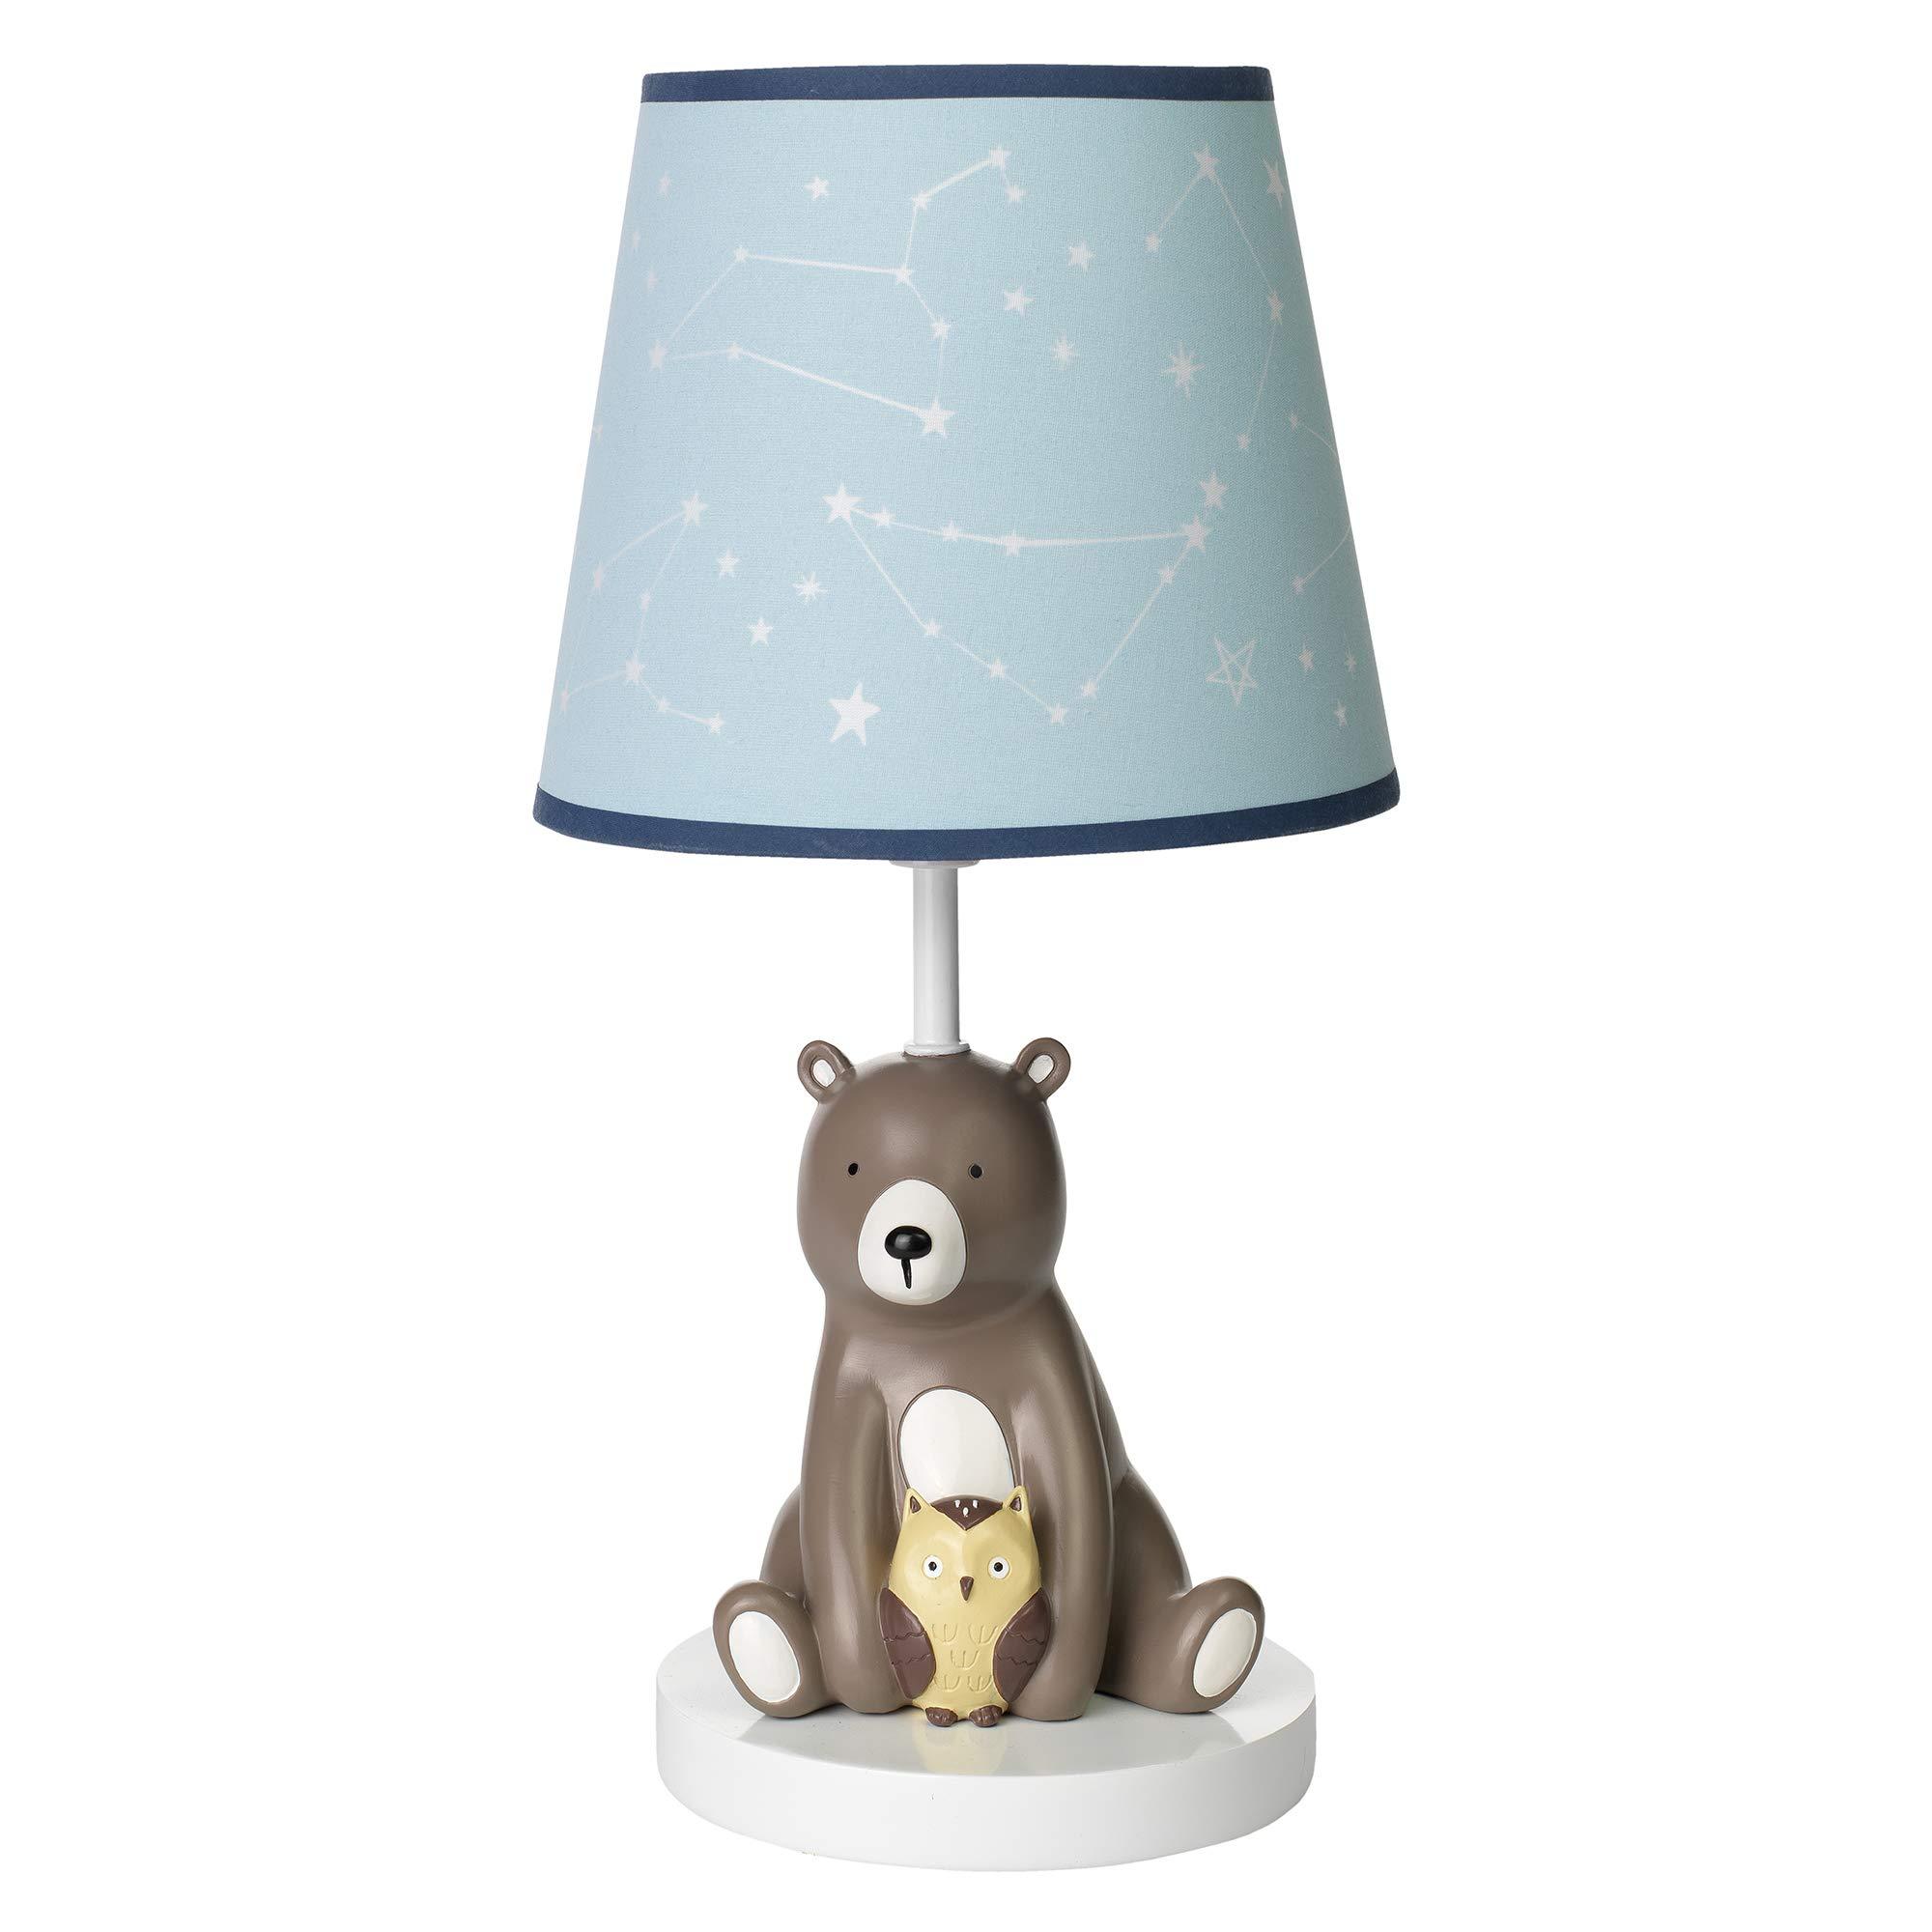 Lambs & Ivy Sierra Sky Blue/Brown Bear Nursery Lamp with Shade & Bulb by Lambs & Ivy